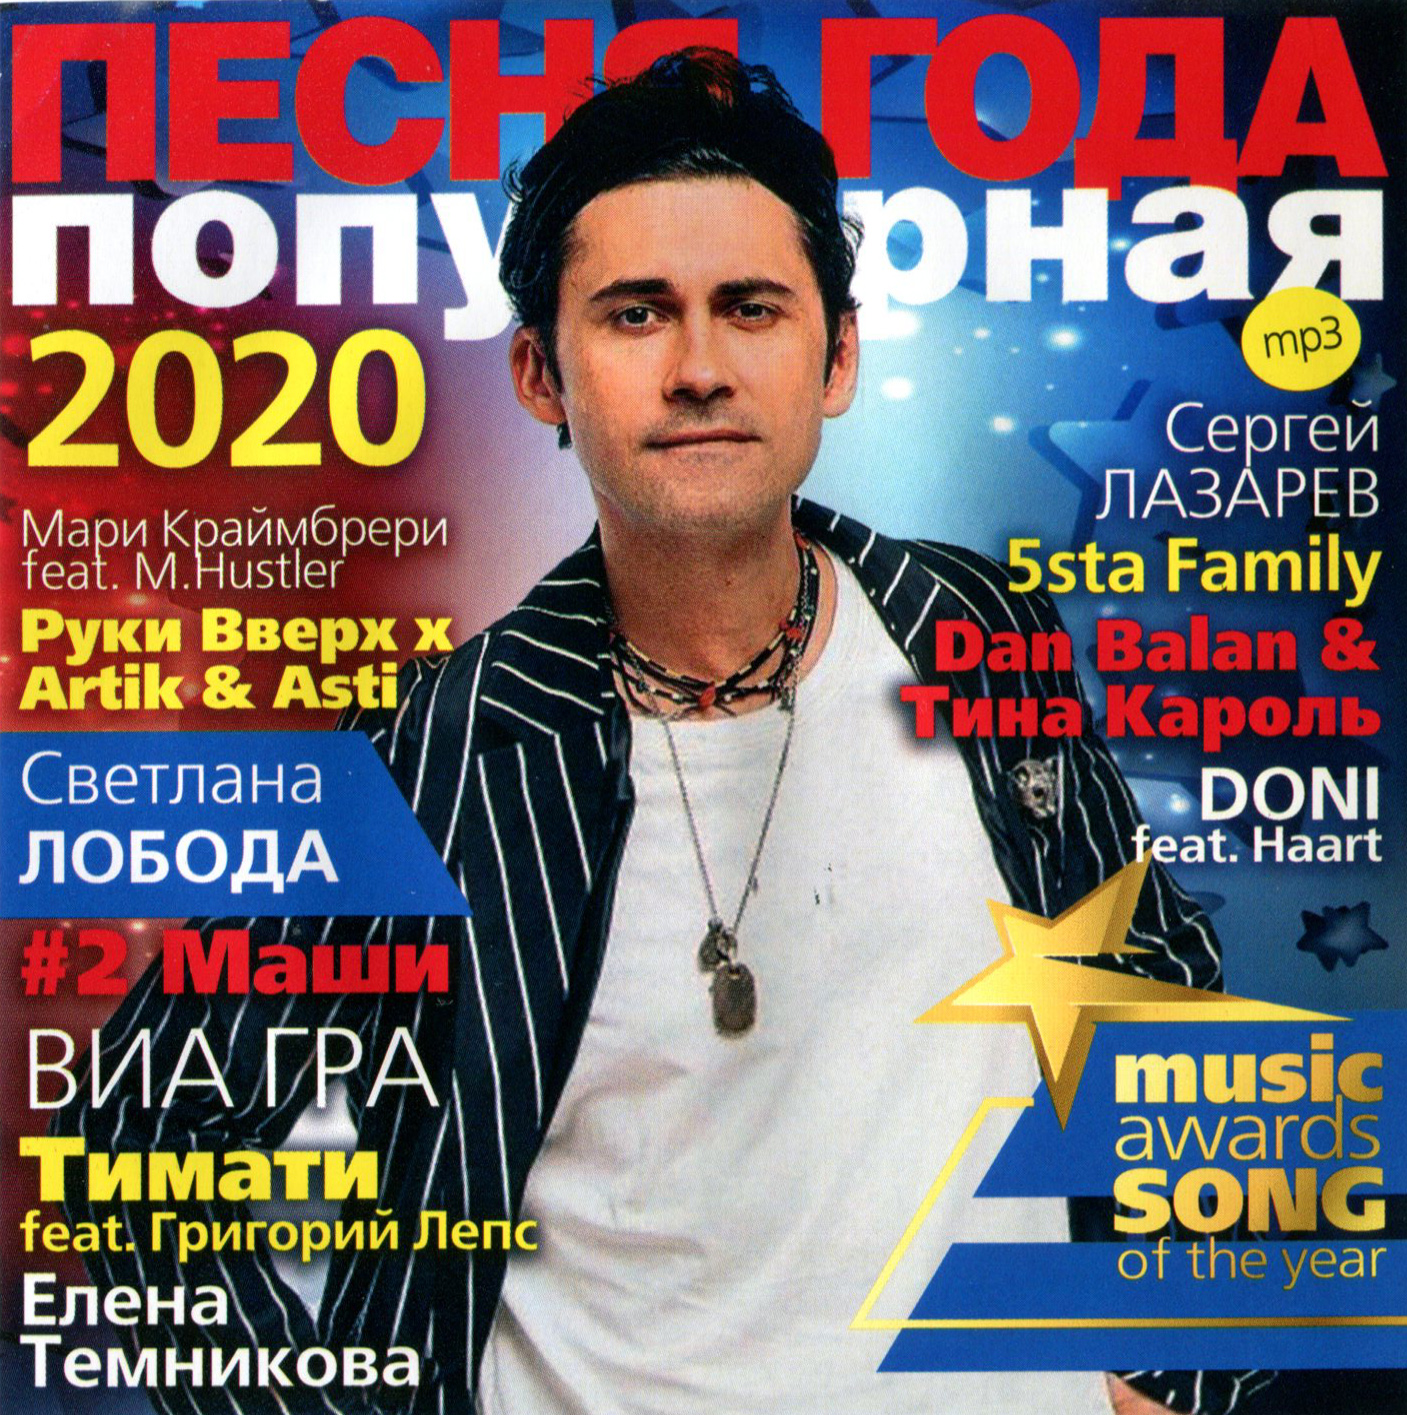 ПЕСНЯ ГОДА - 2020 популярная [mp3]